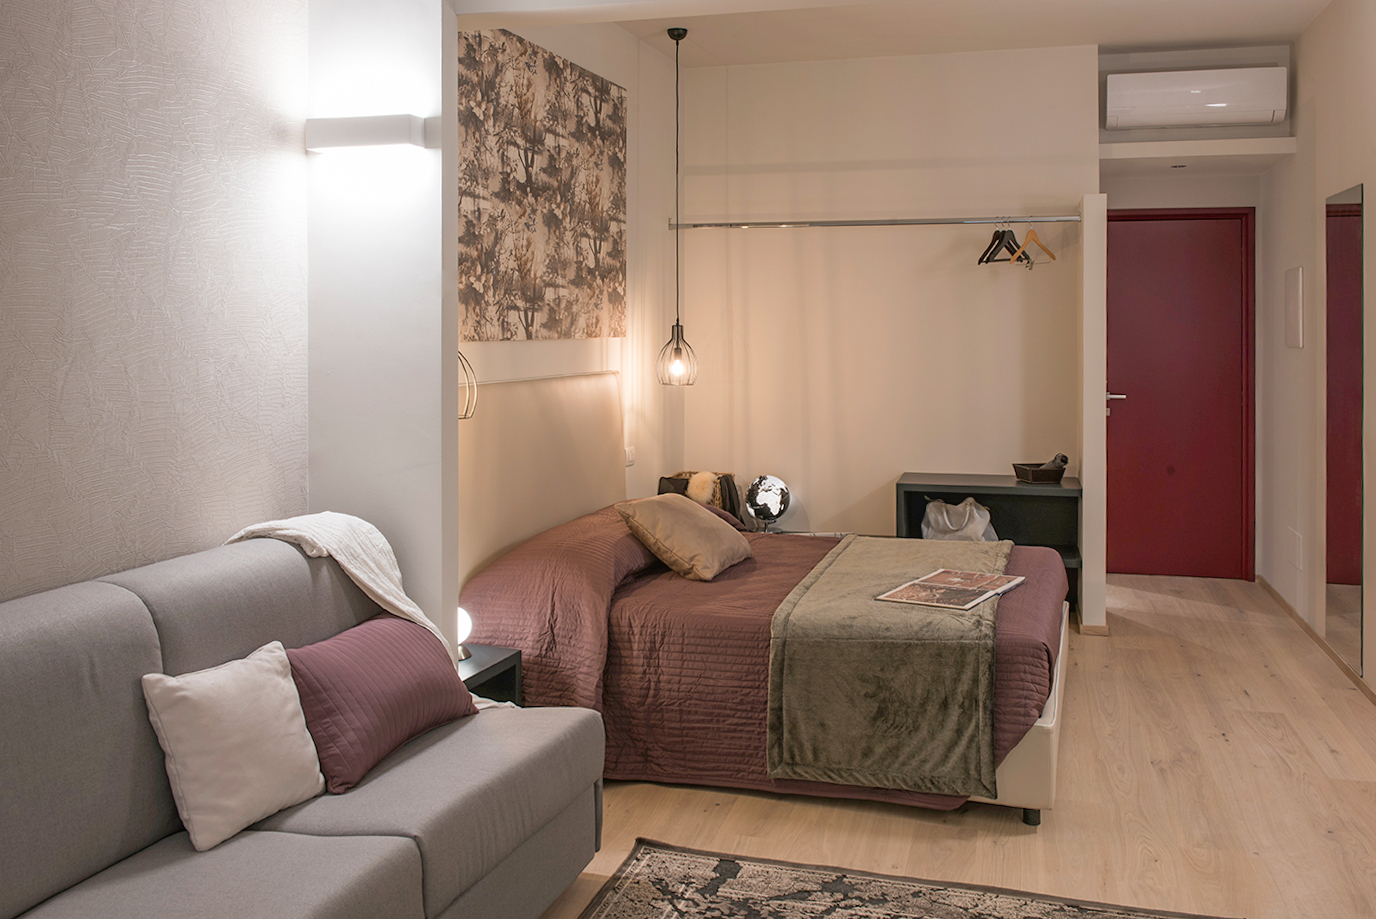 Appartamenti in via Quattro Spade (11).jpg